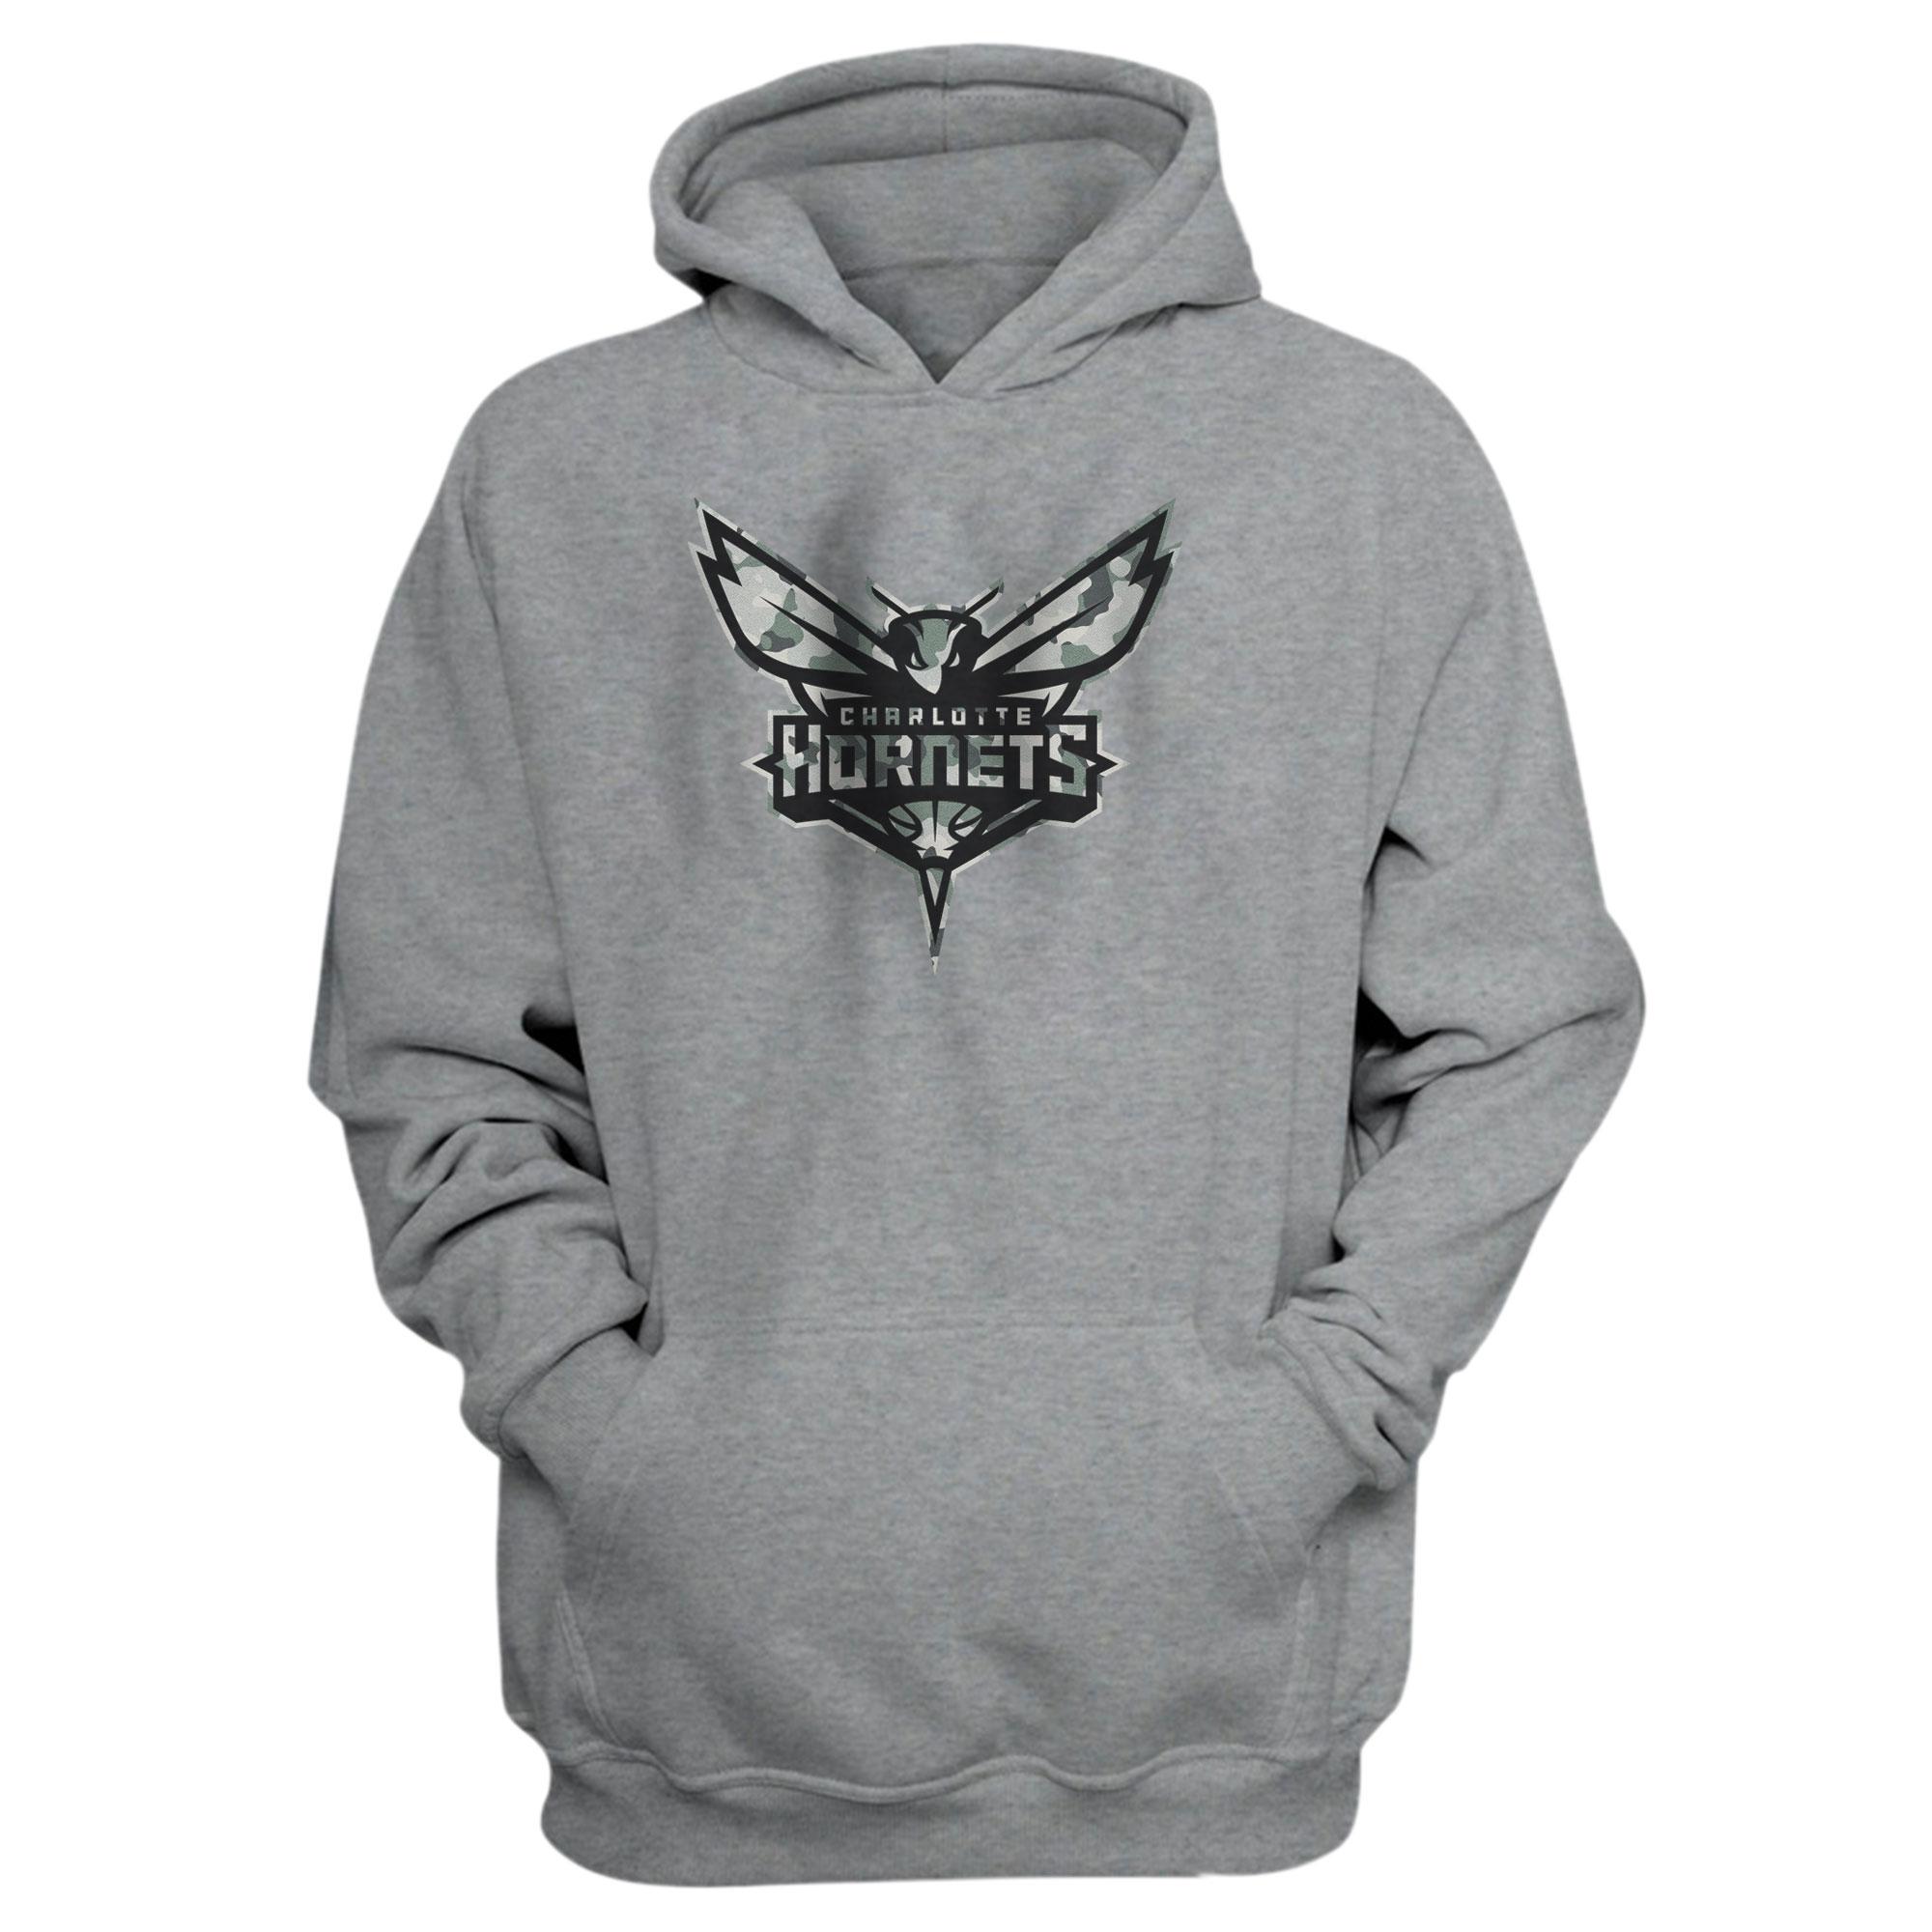 Charlotte Hornets Hoodie (HD-GRY-407-NBA-CHRL-HRNT-NEW)